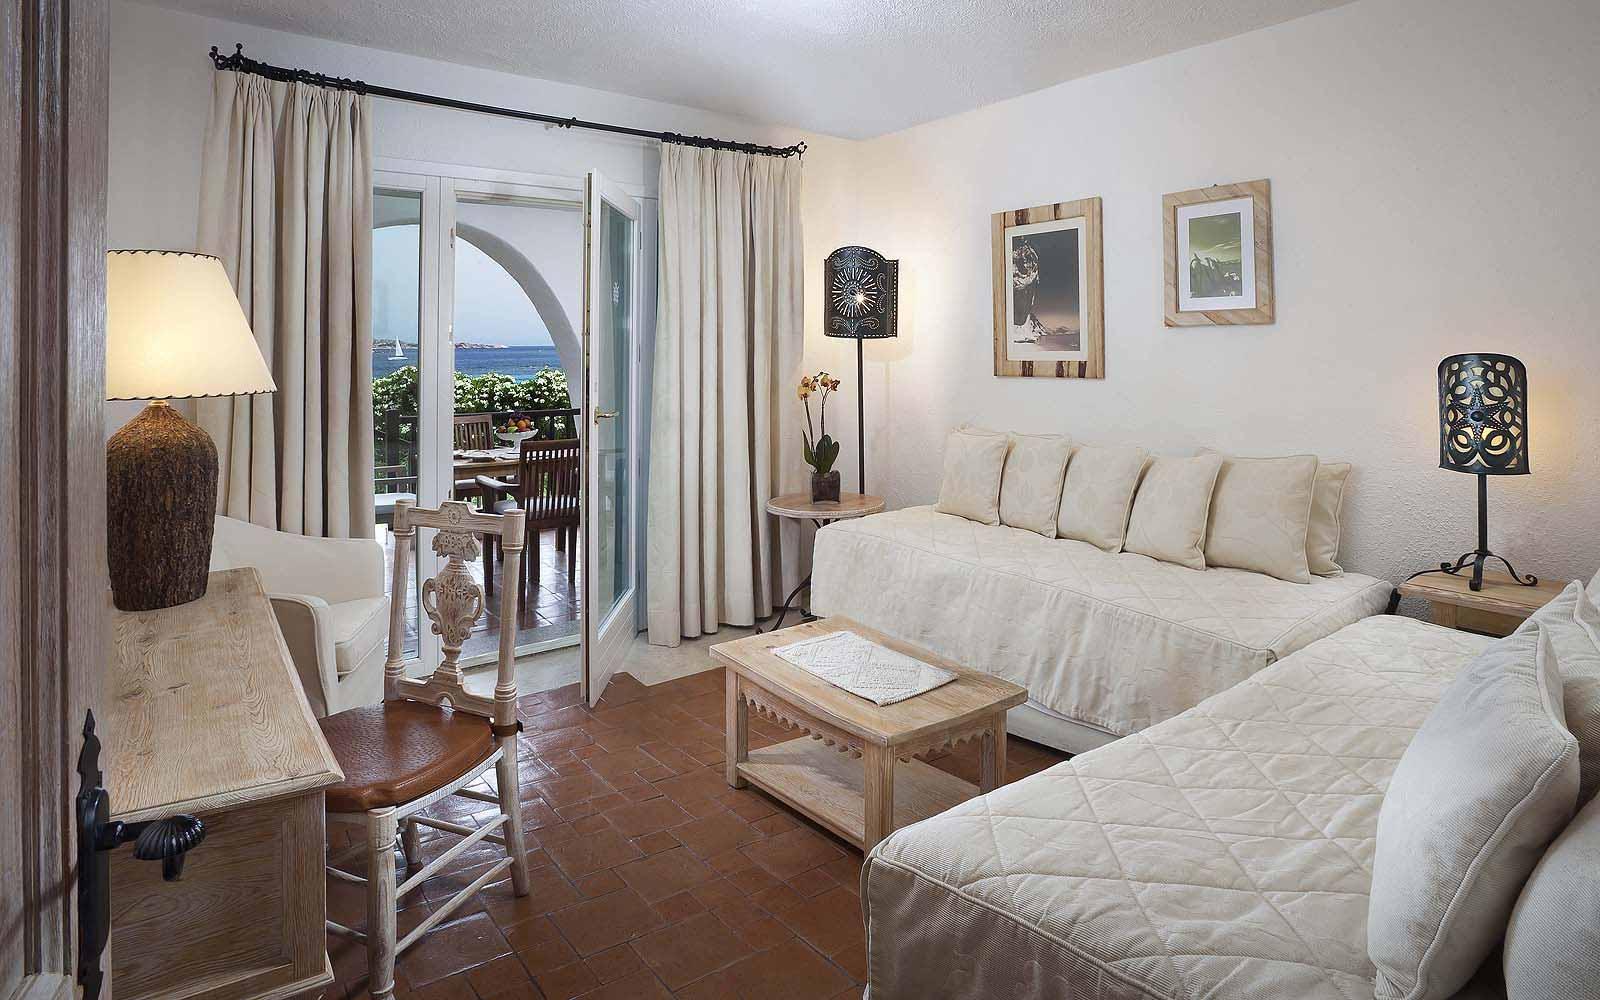 A Premium Suite's lounge at the Hotel Romazzino